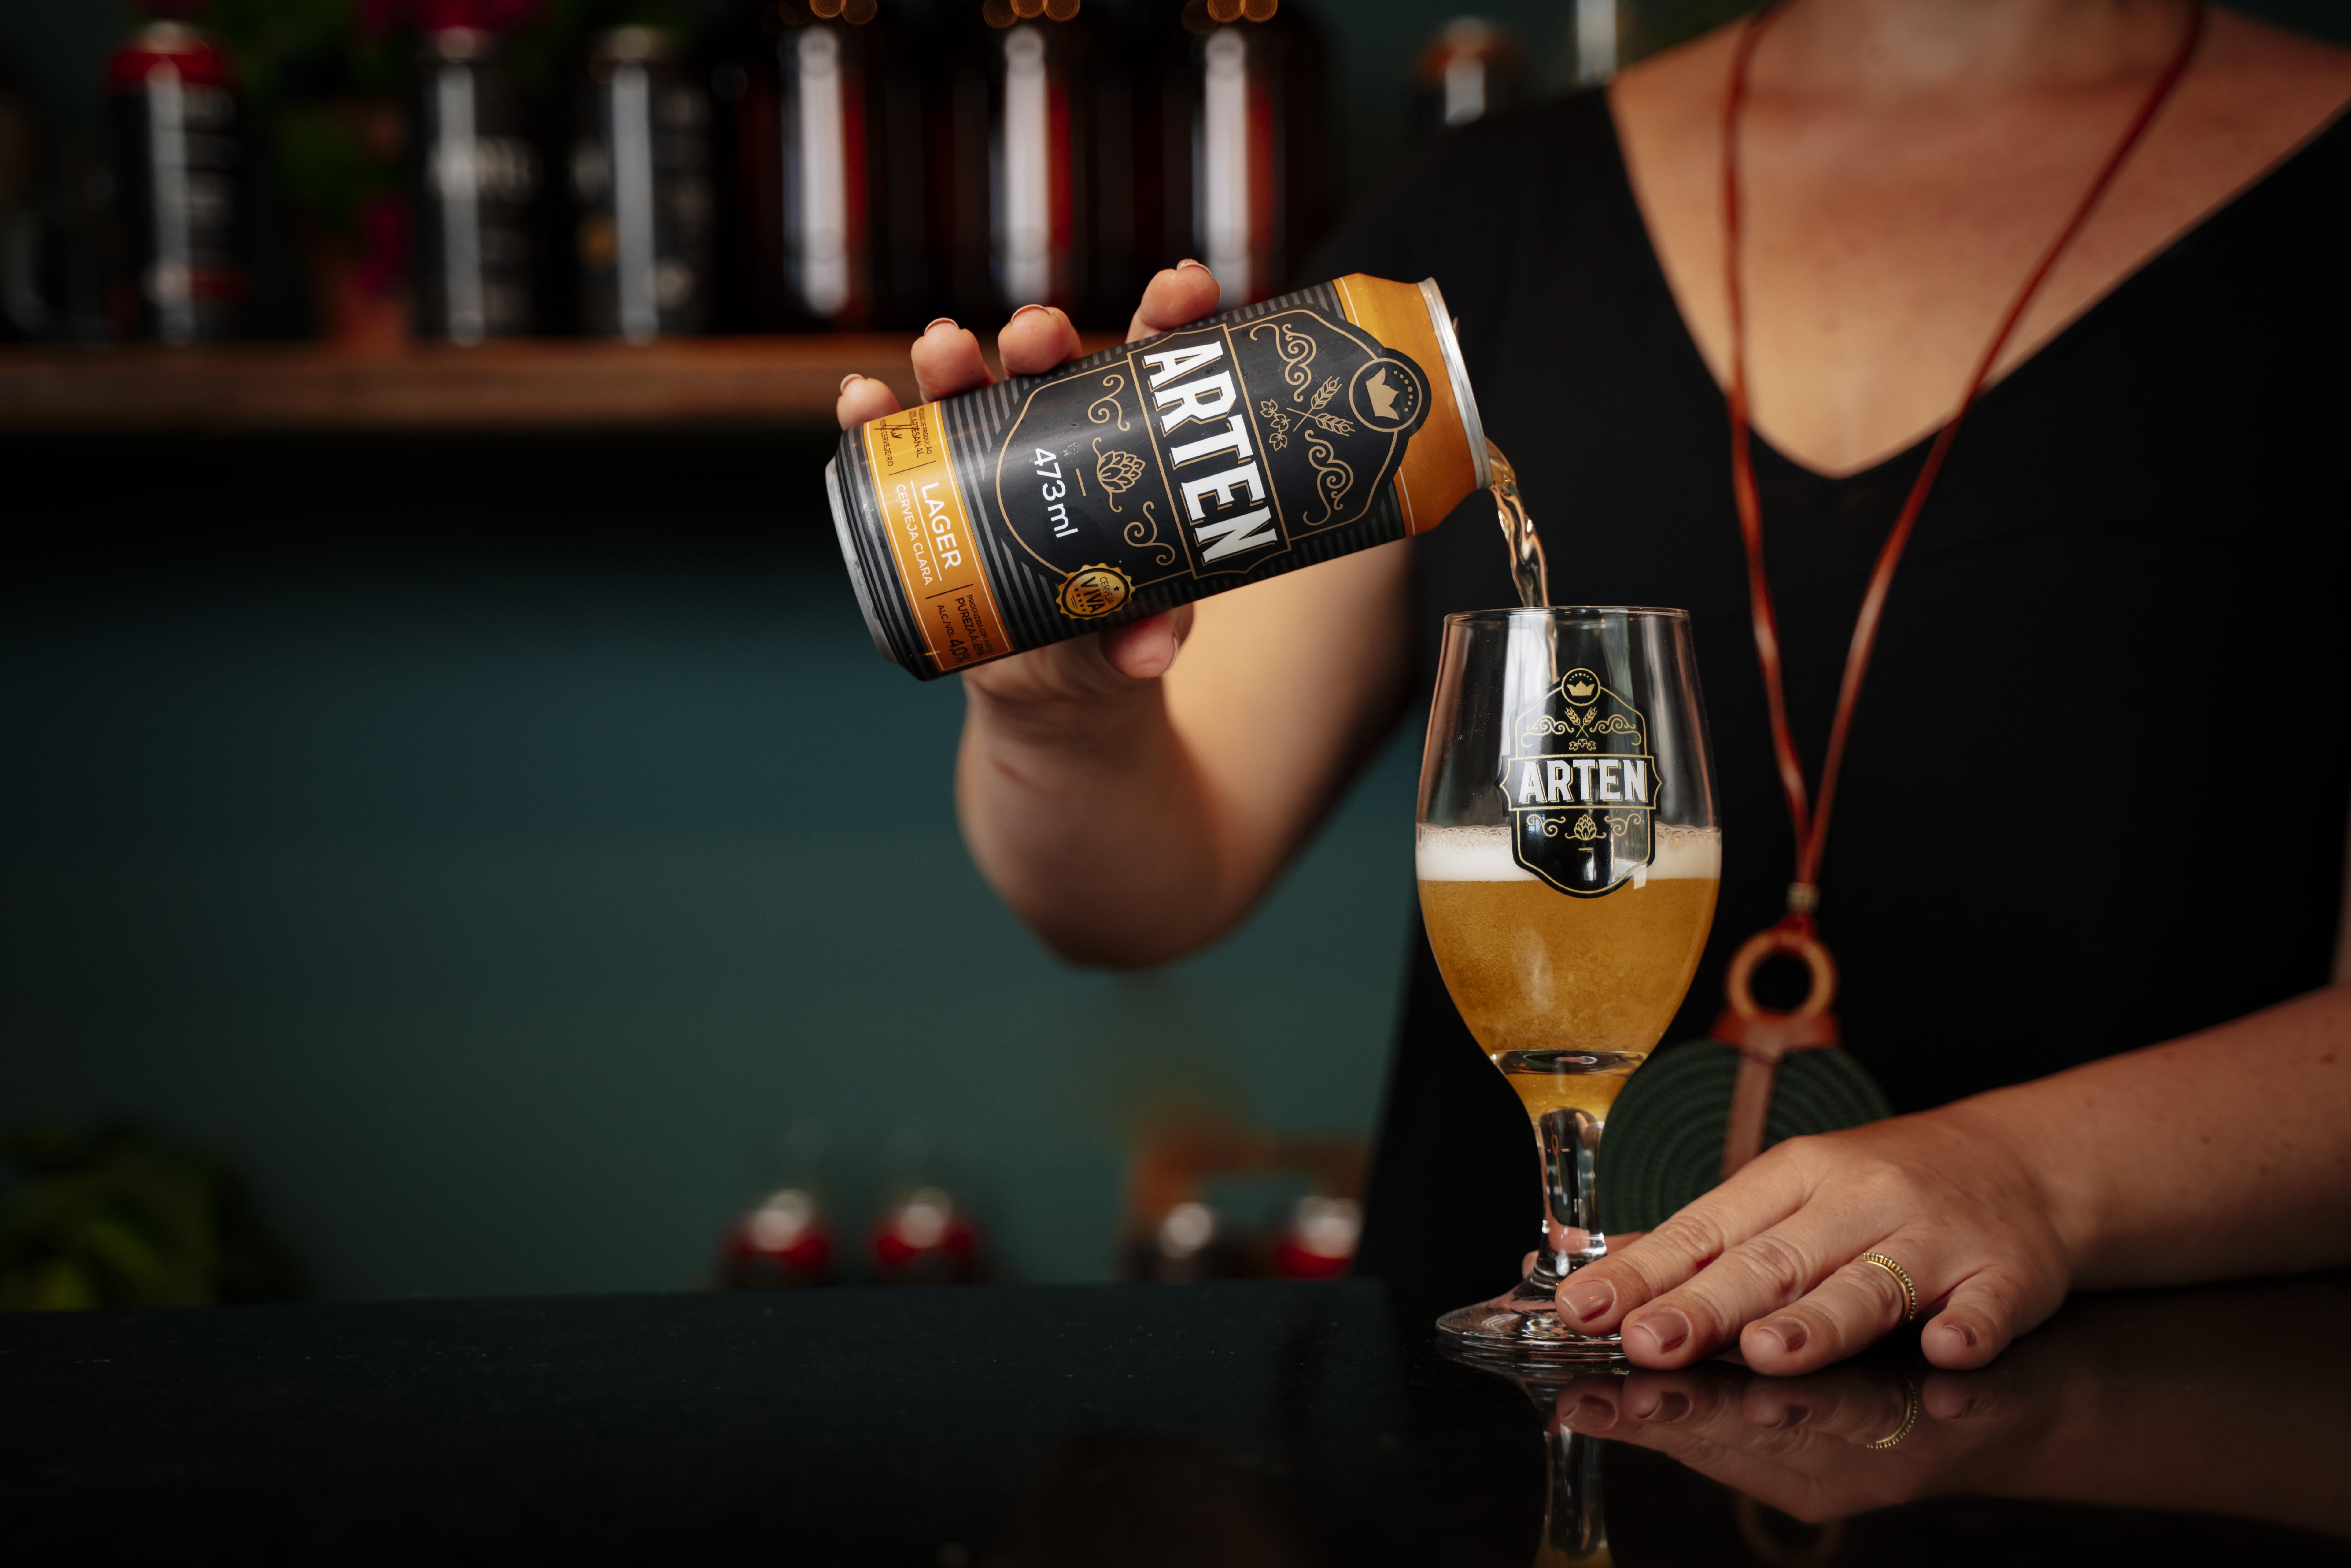 Cervejaria Arten